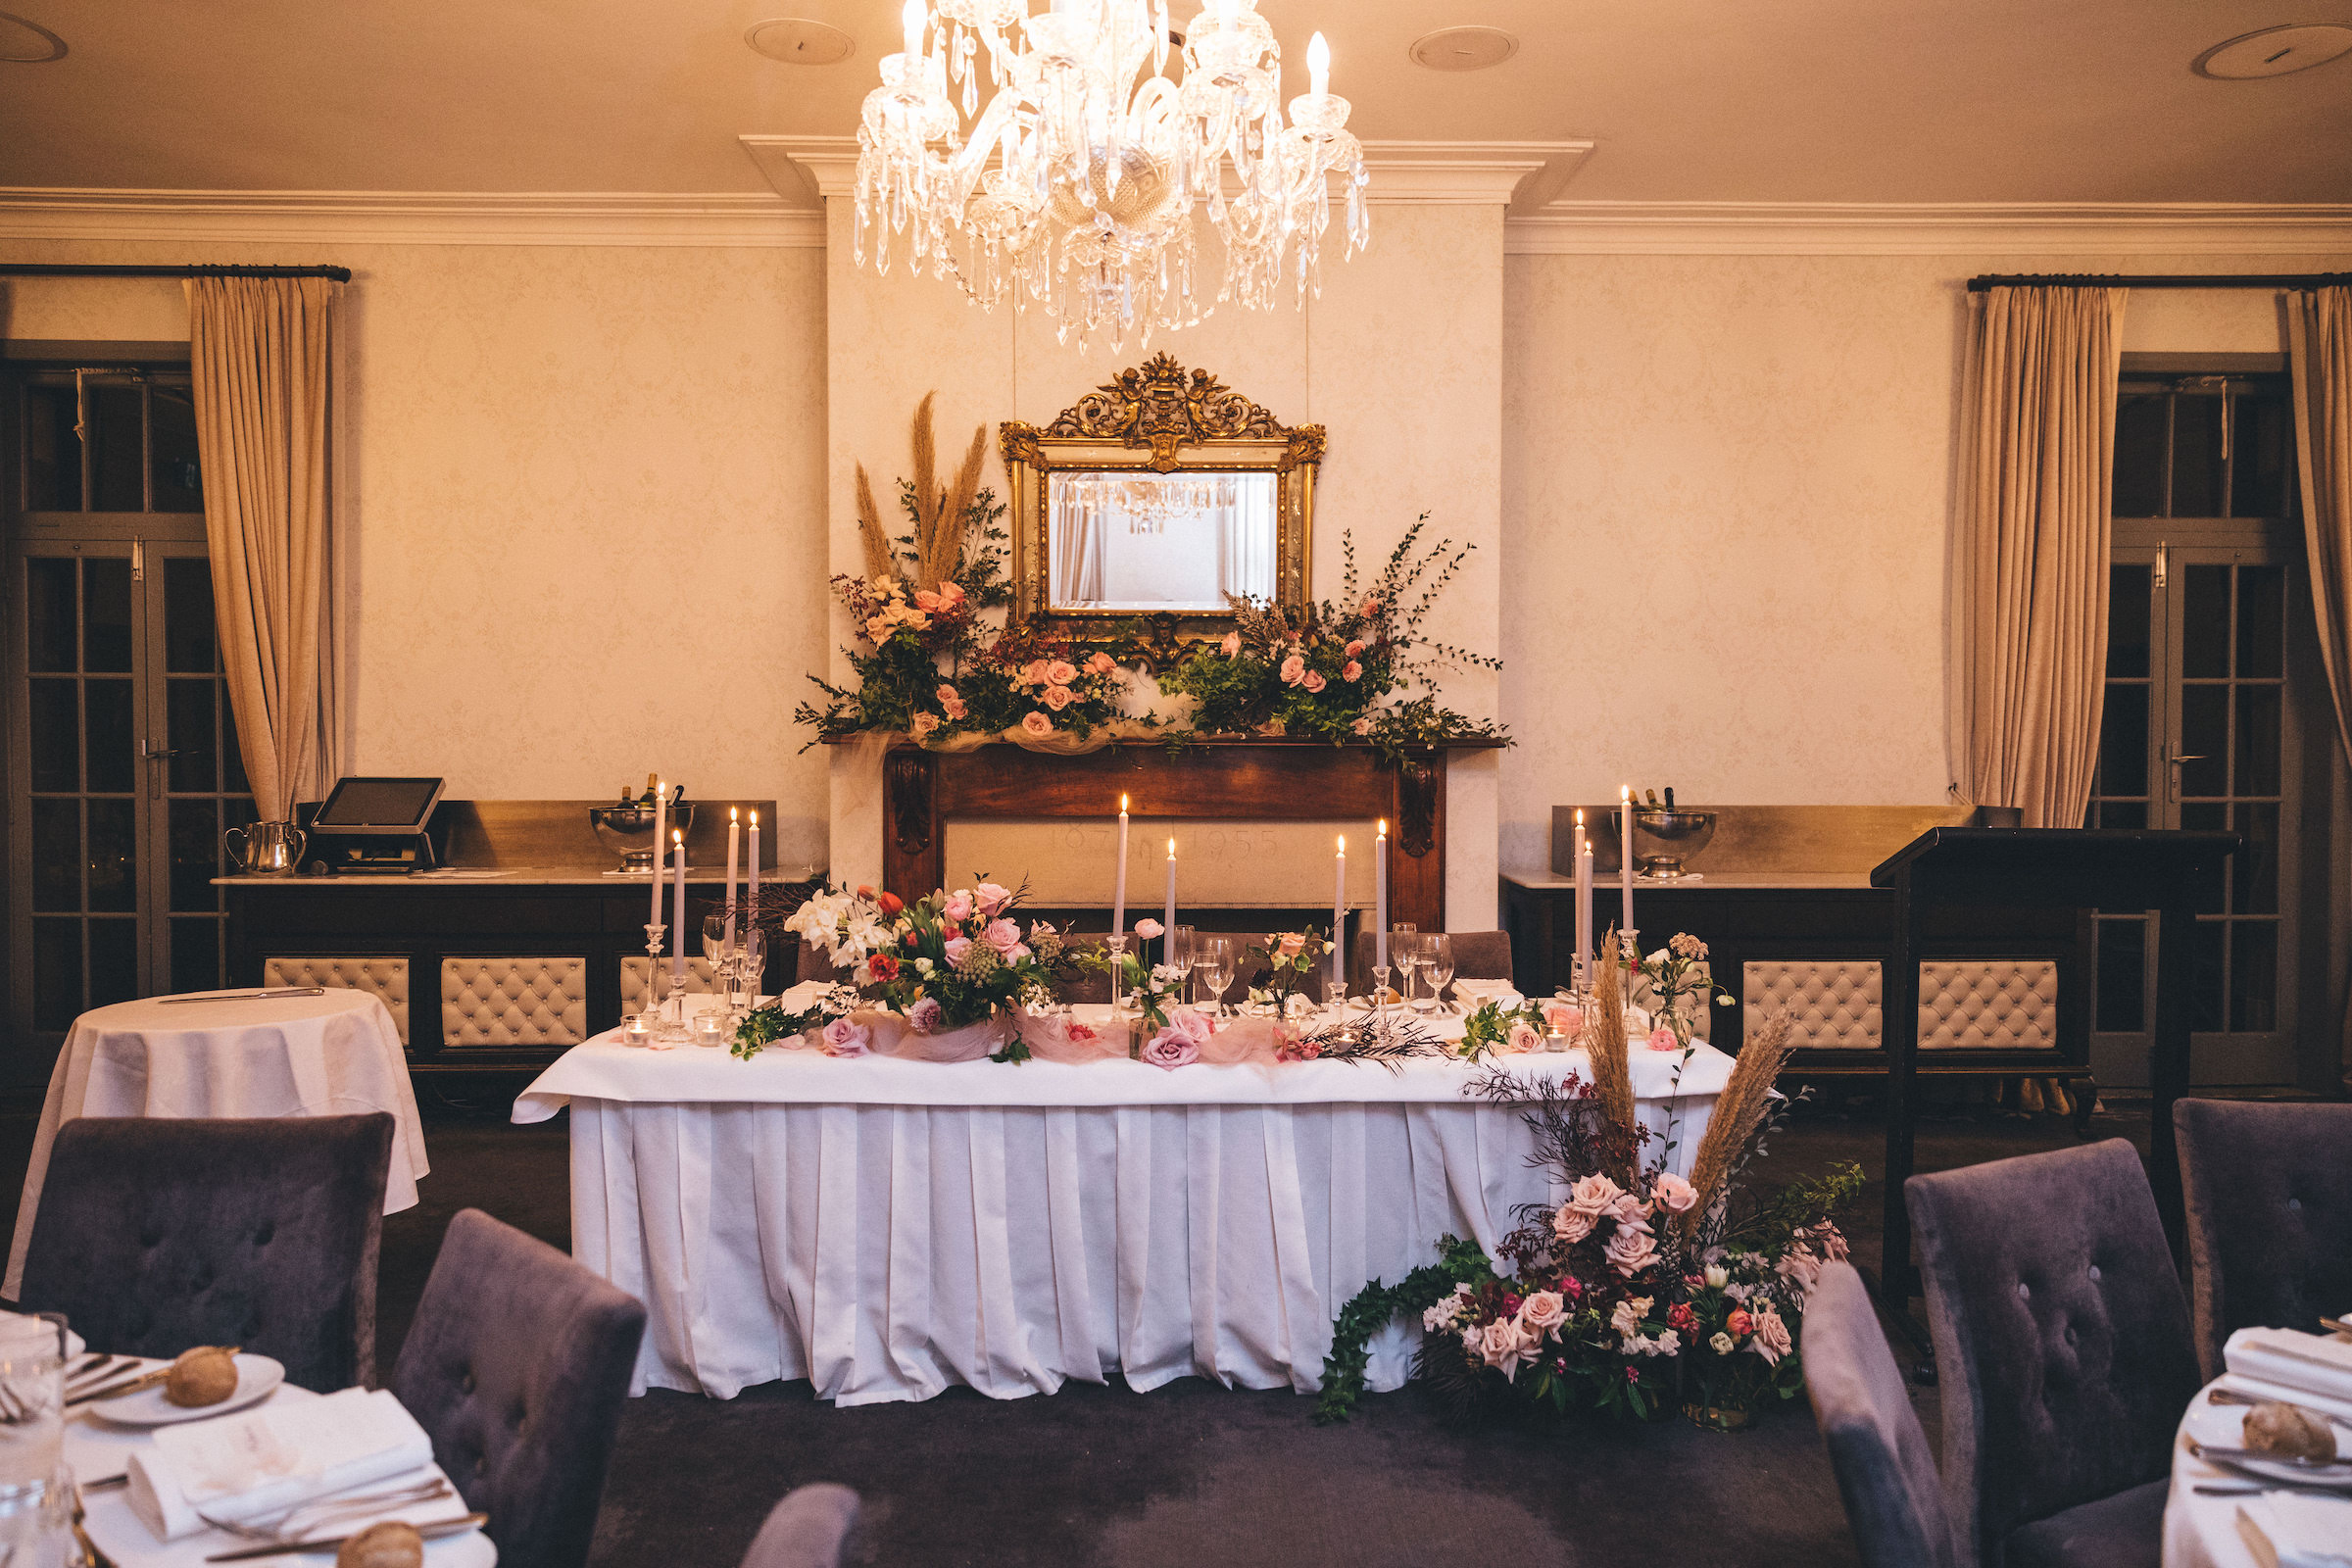 Gunners-Barracks-Wedding-AnnMarieYuen-LimeTreeBower27.jpg